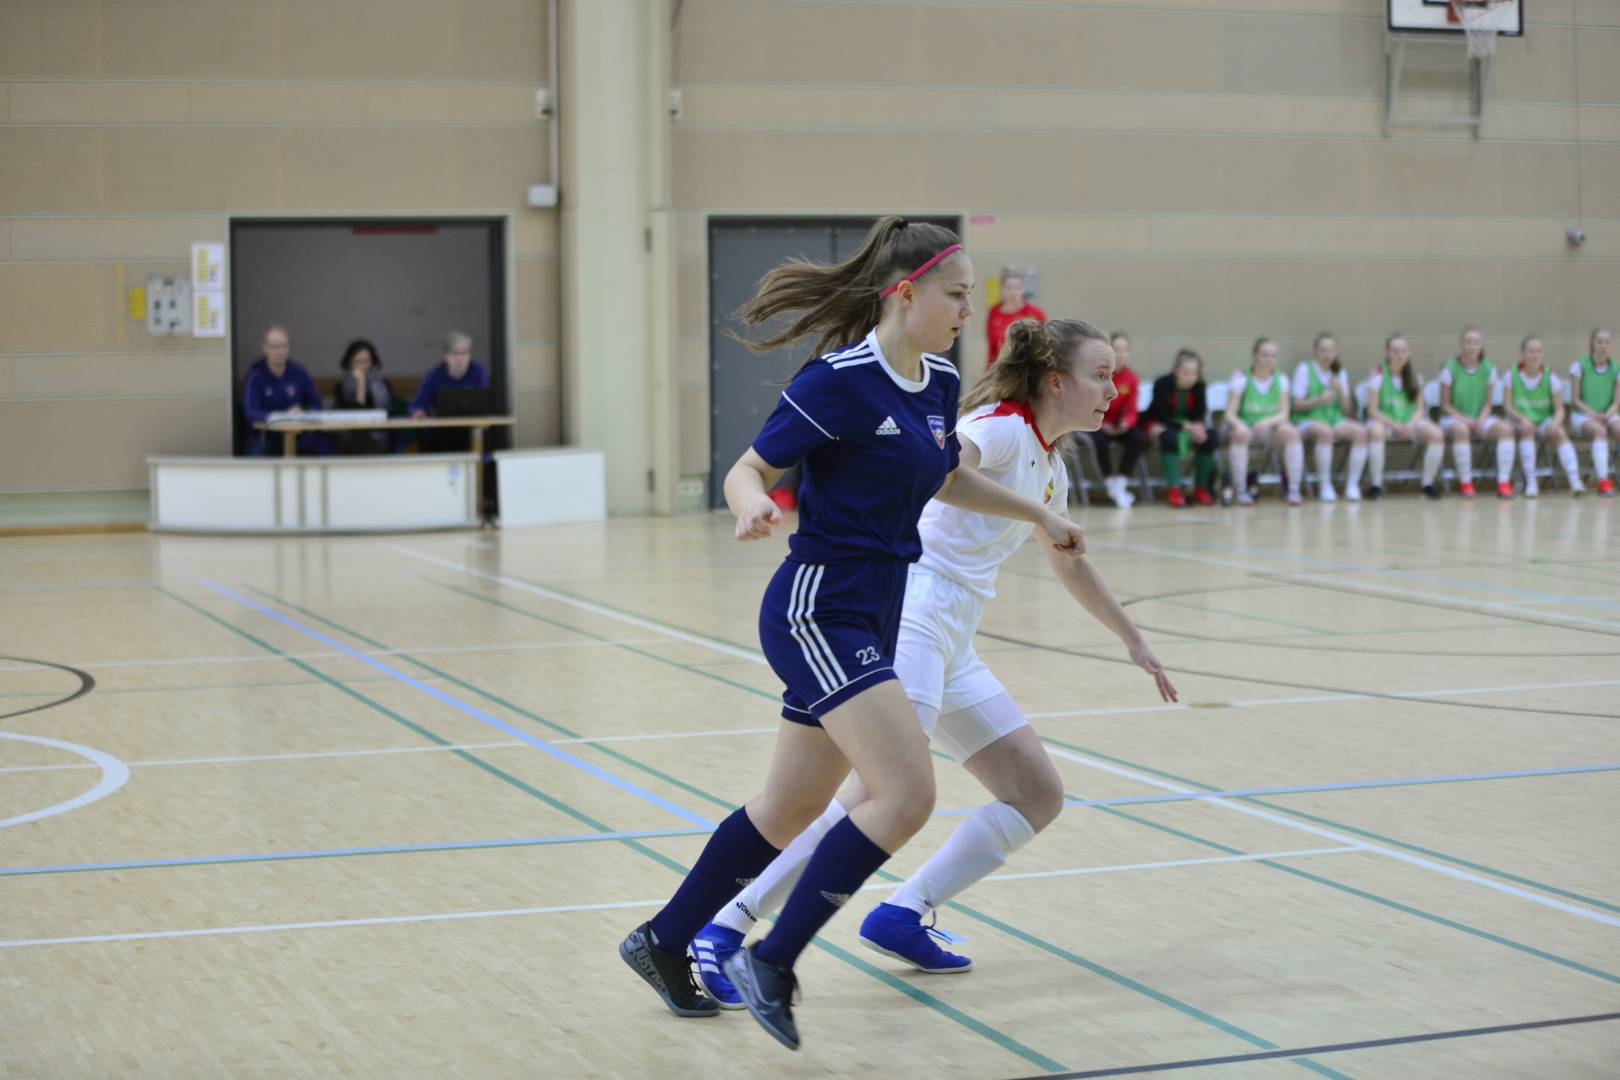 Seuraava pelaaja liigarosteriin varmistui - Annika Peippo liigasopimukseen